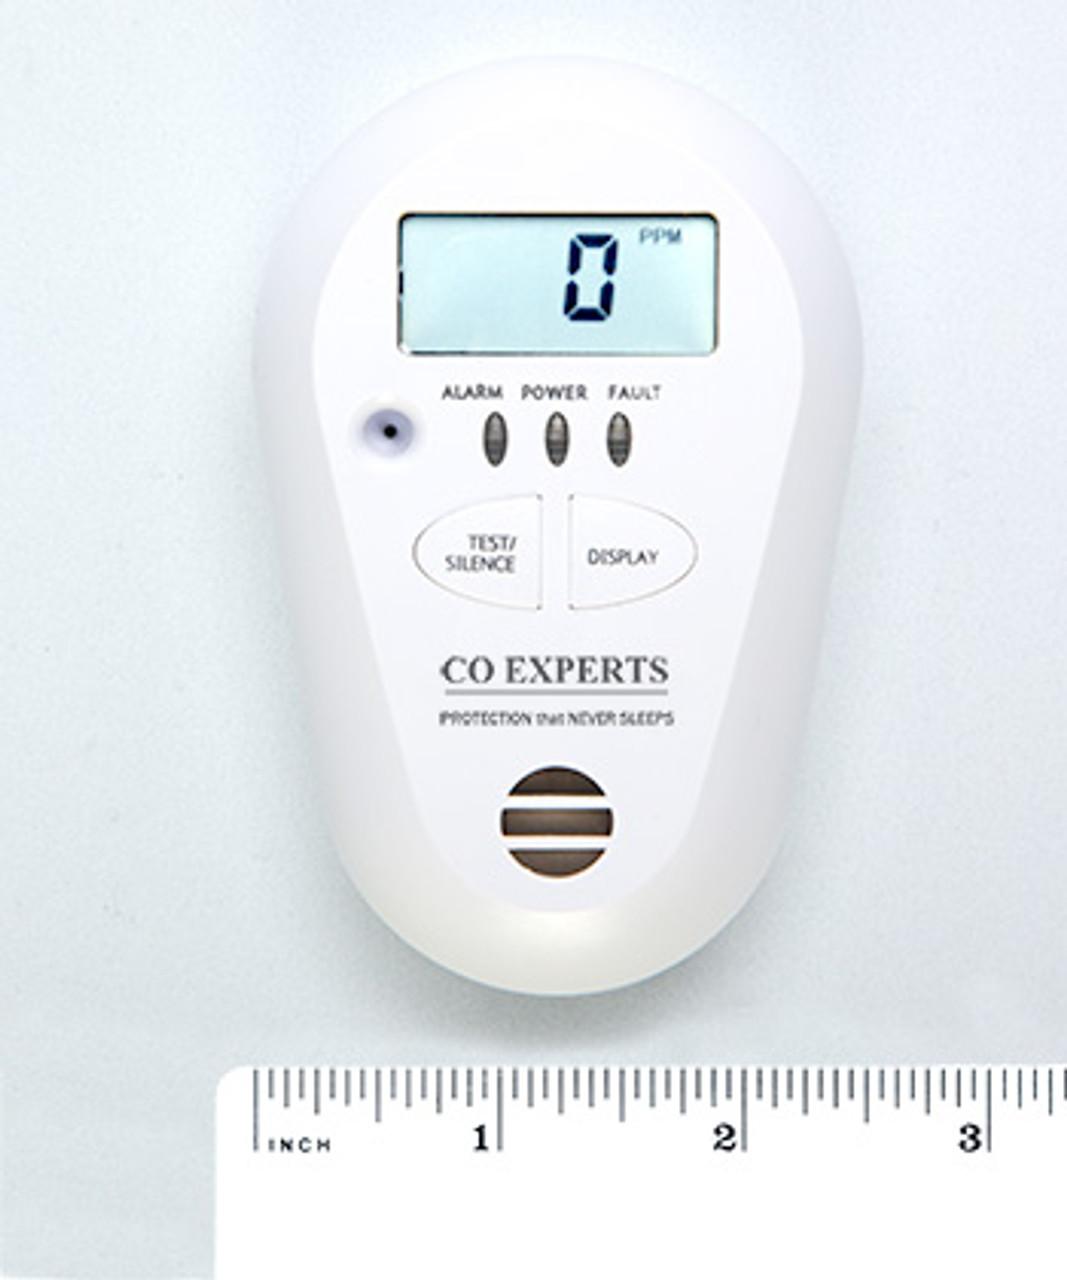 CO Experts Model 2016  Low Level Carbon Monoxide Health Monitor - 2016-10